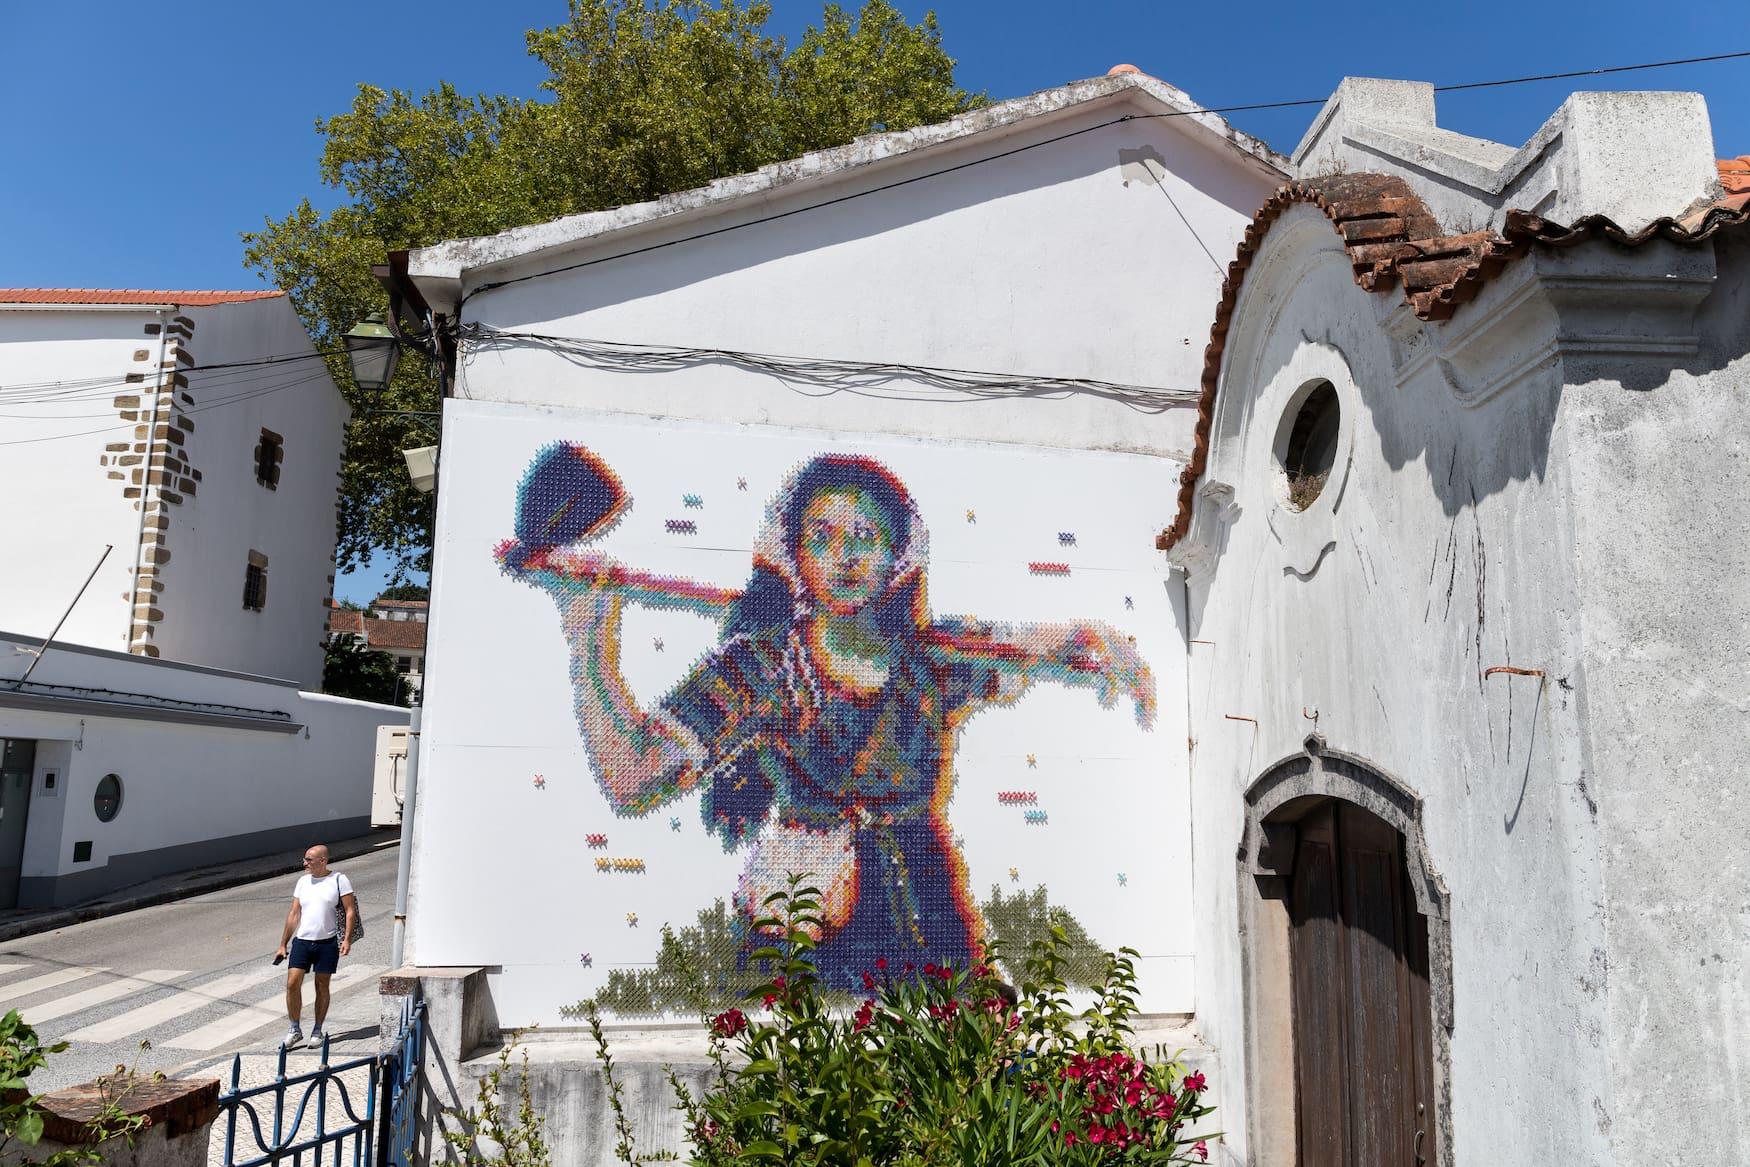 Street-Art des Künstlers Aheneah im Centro de Portugal